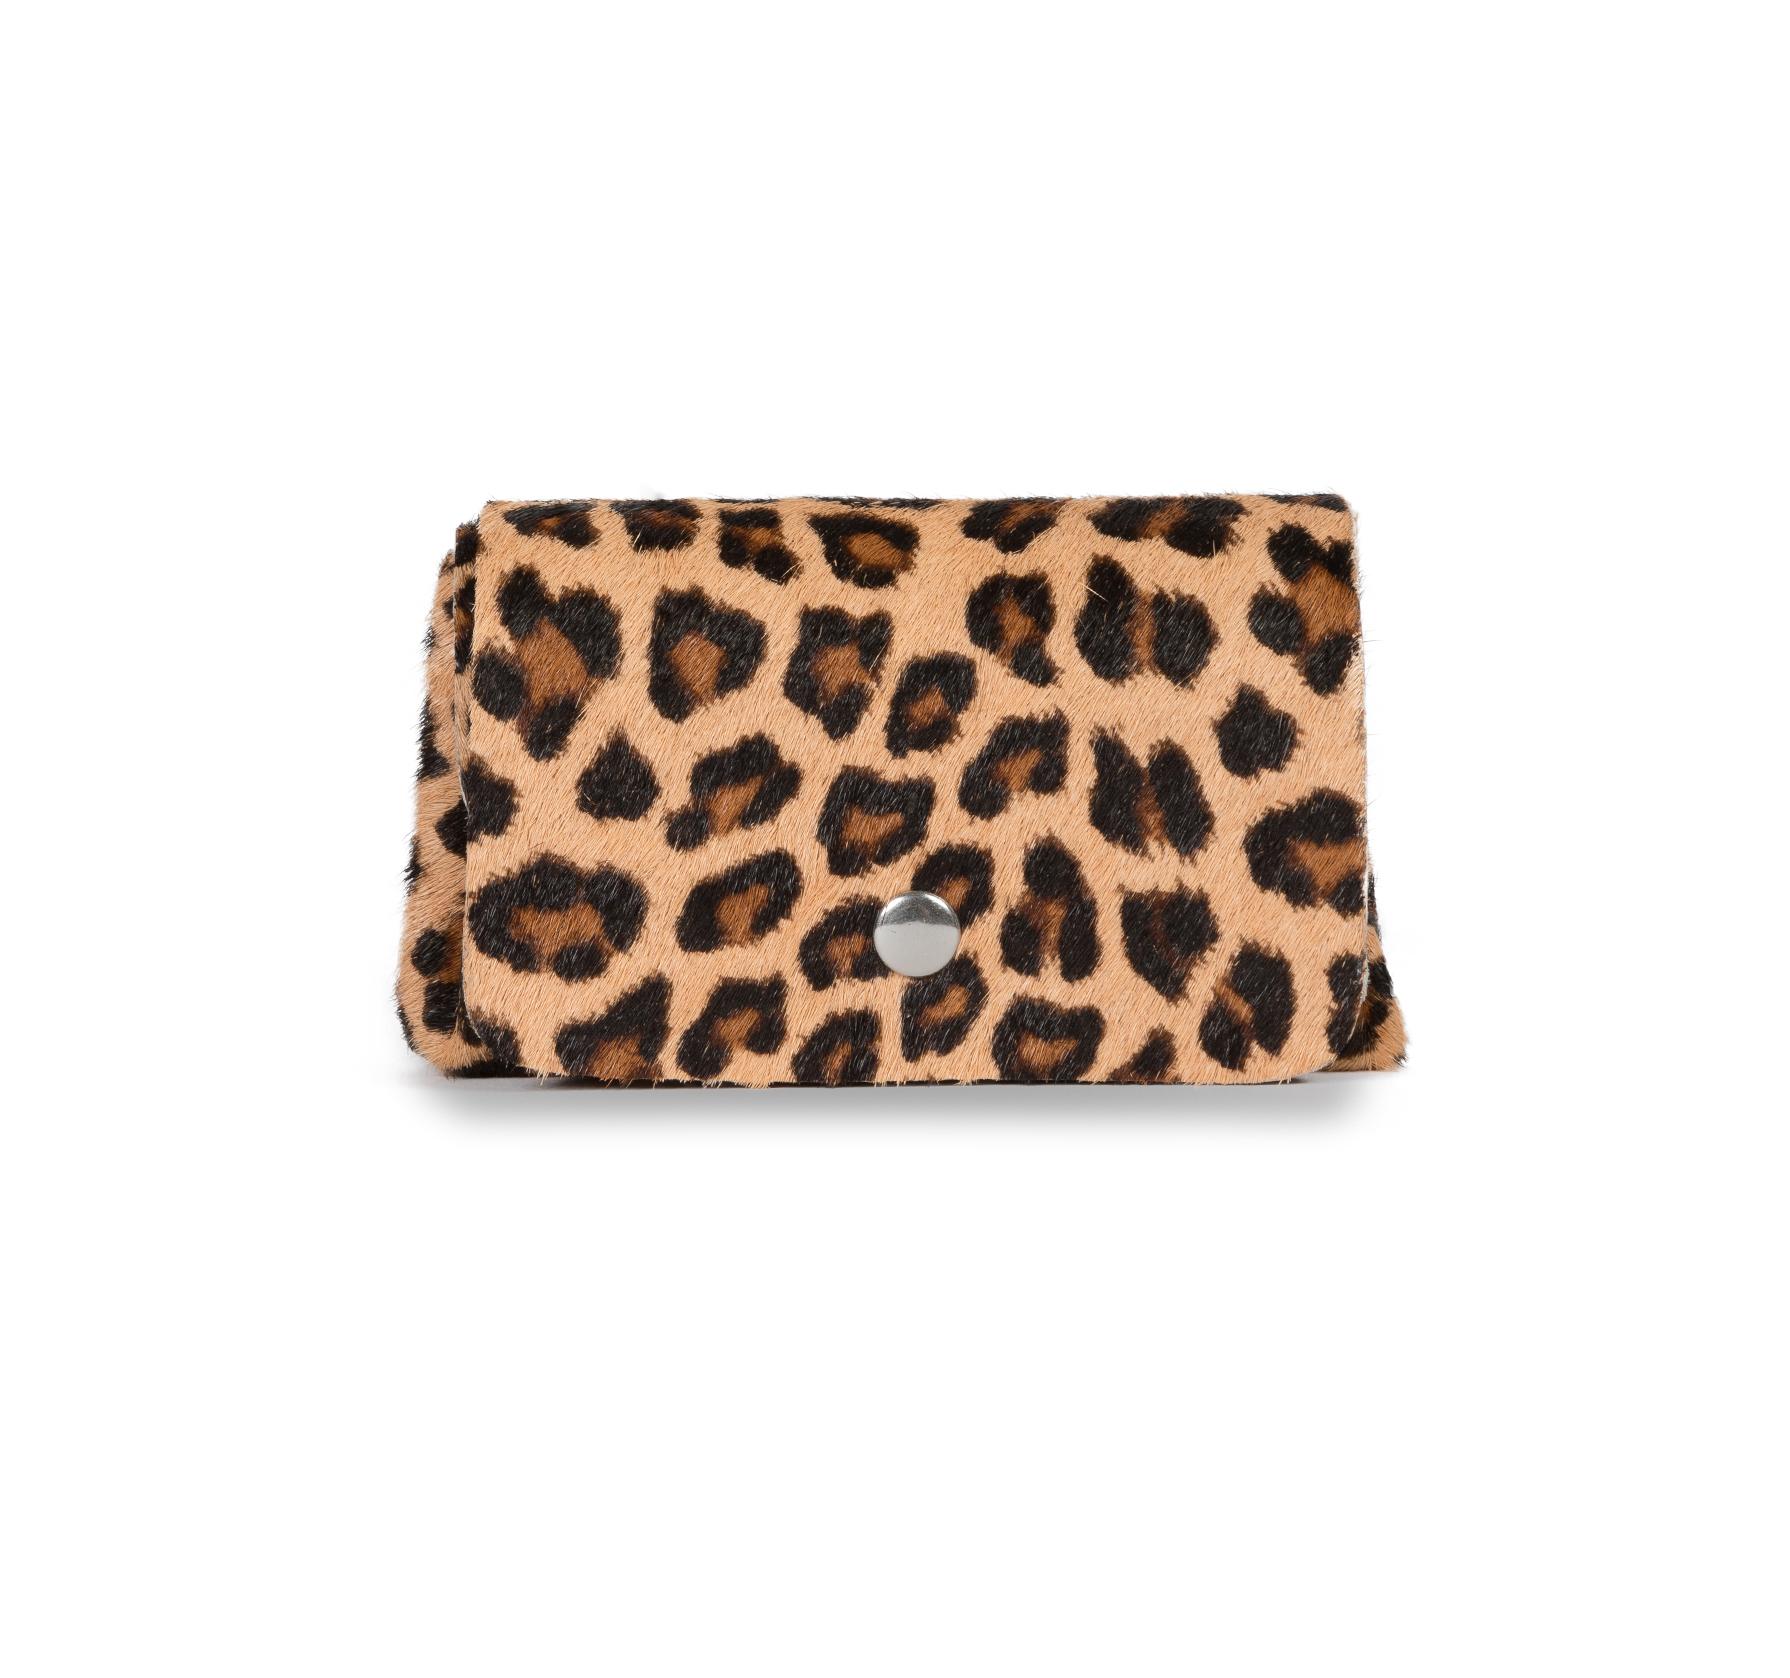 1aa77fe0a42c Porte Monnaie à Soufflets INES Cuir impression léopard